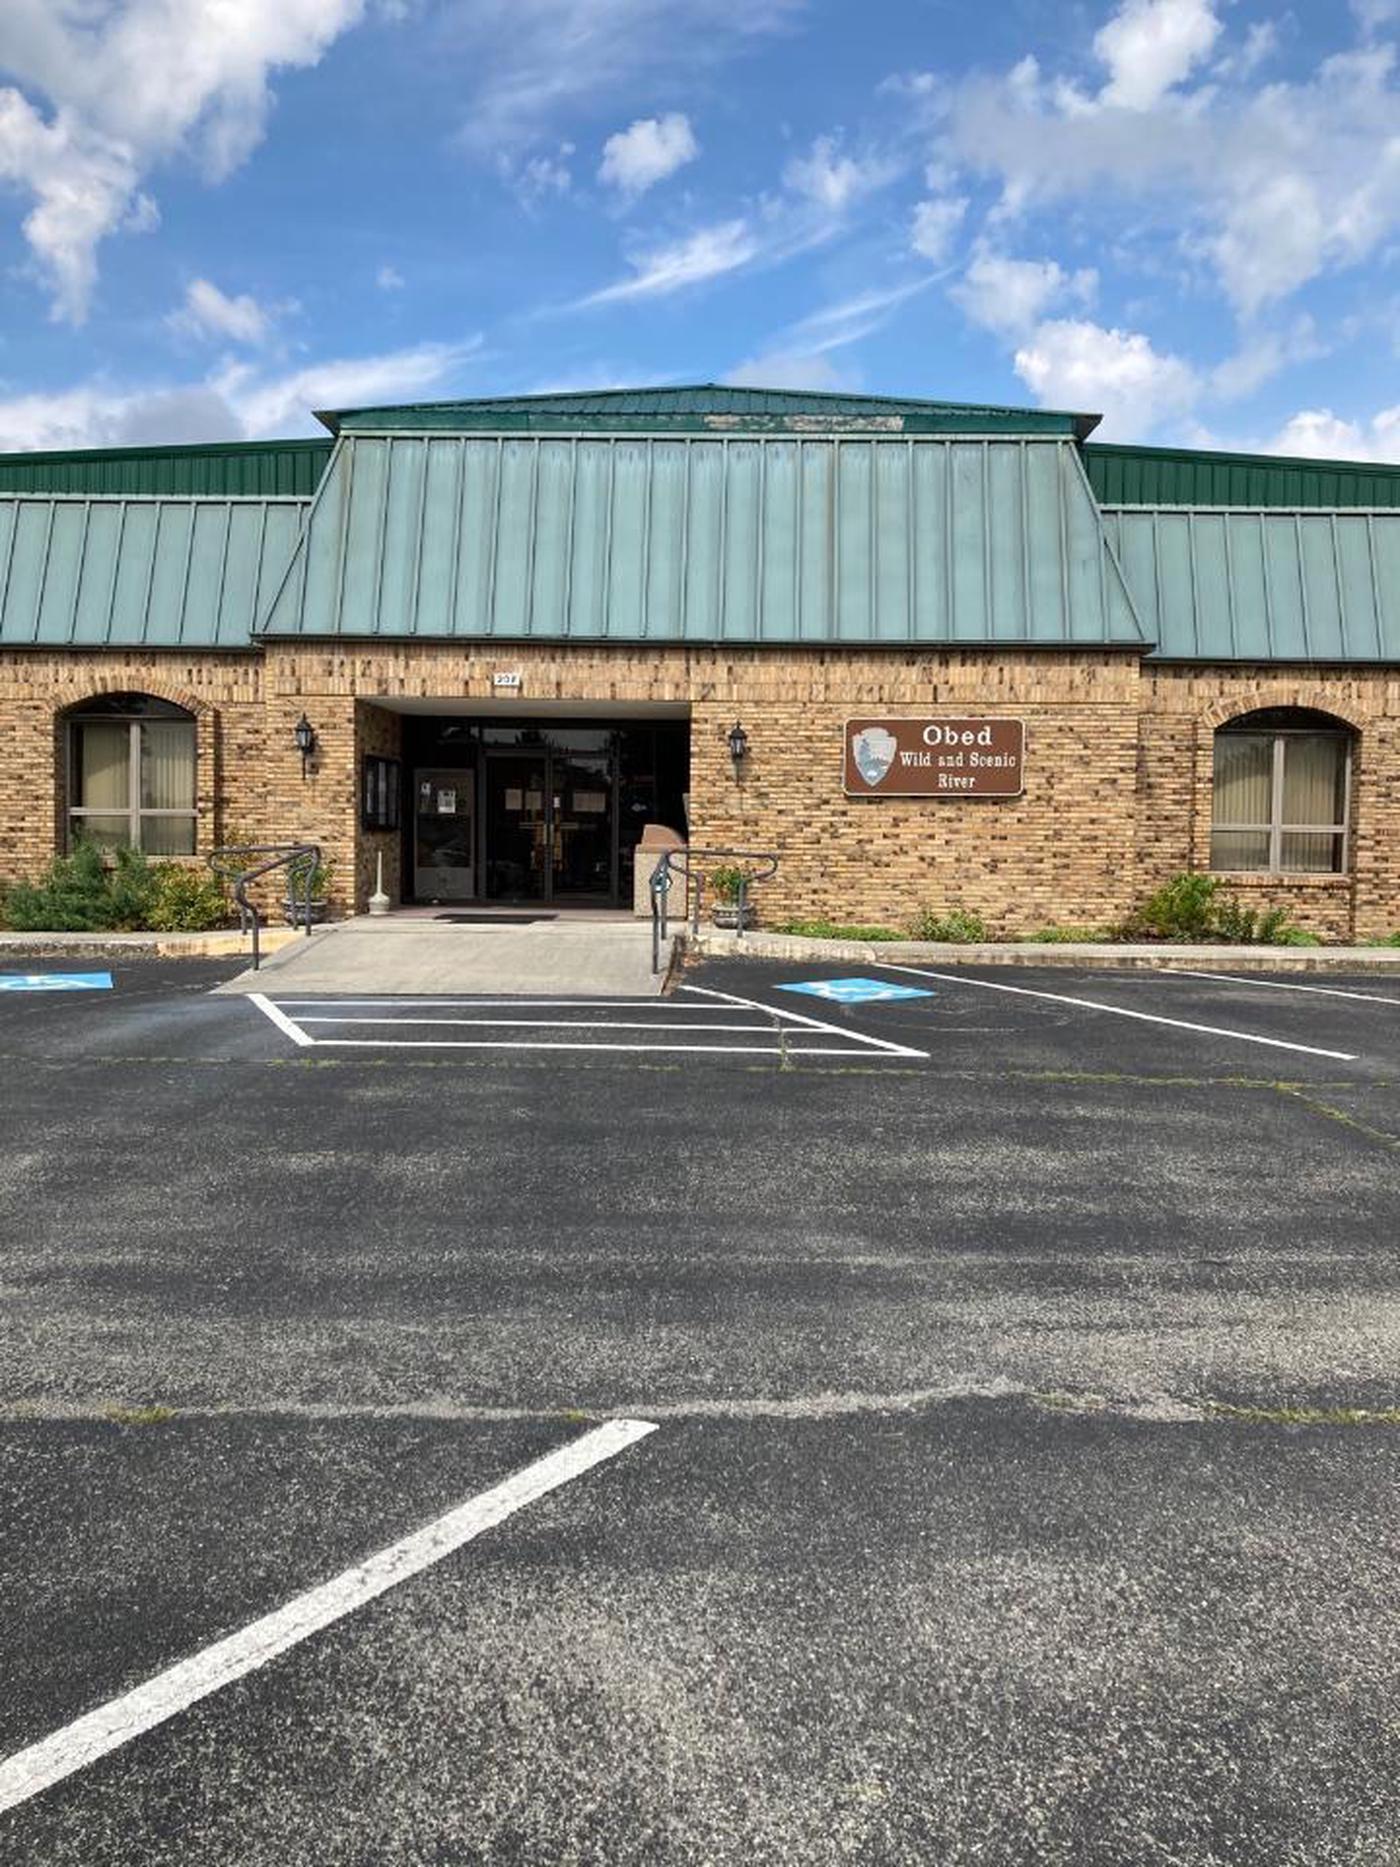 Obed Wild and Scenic River Visitor Center